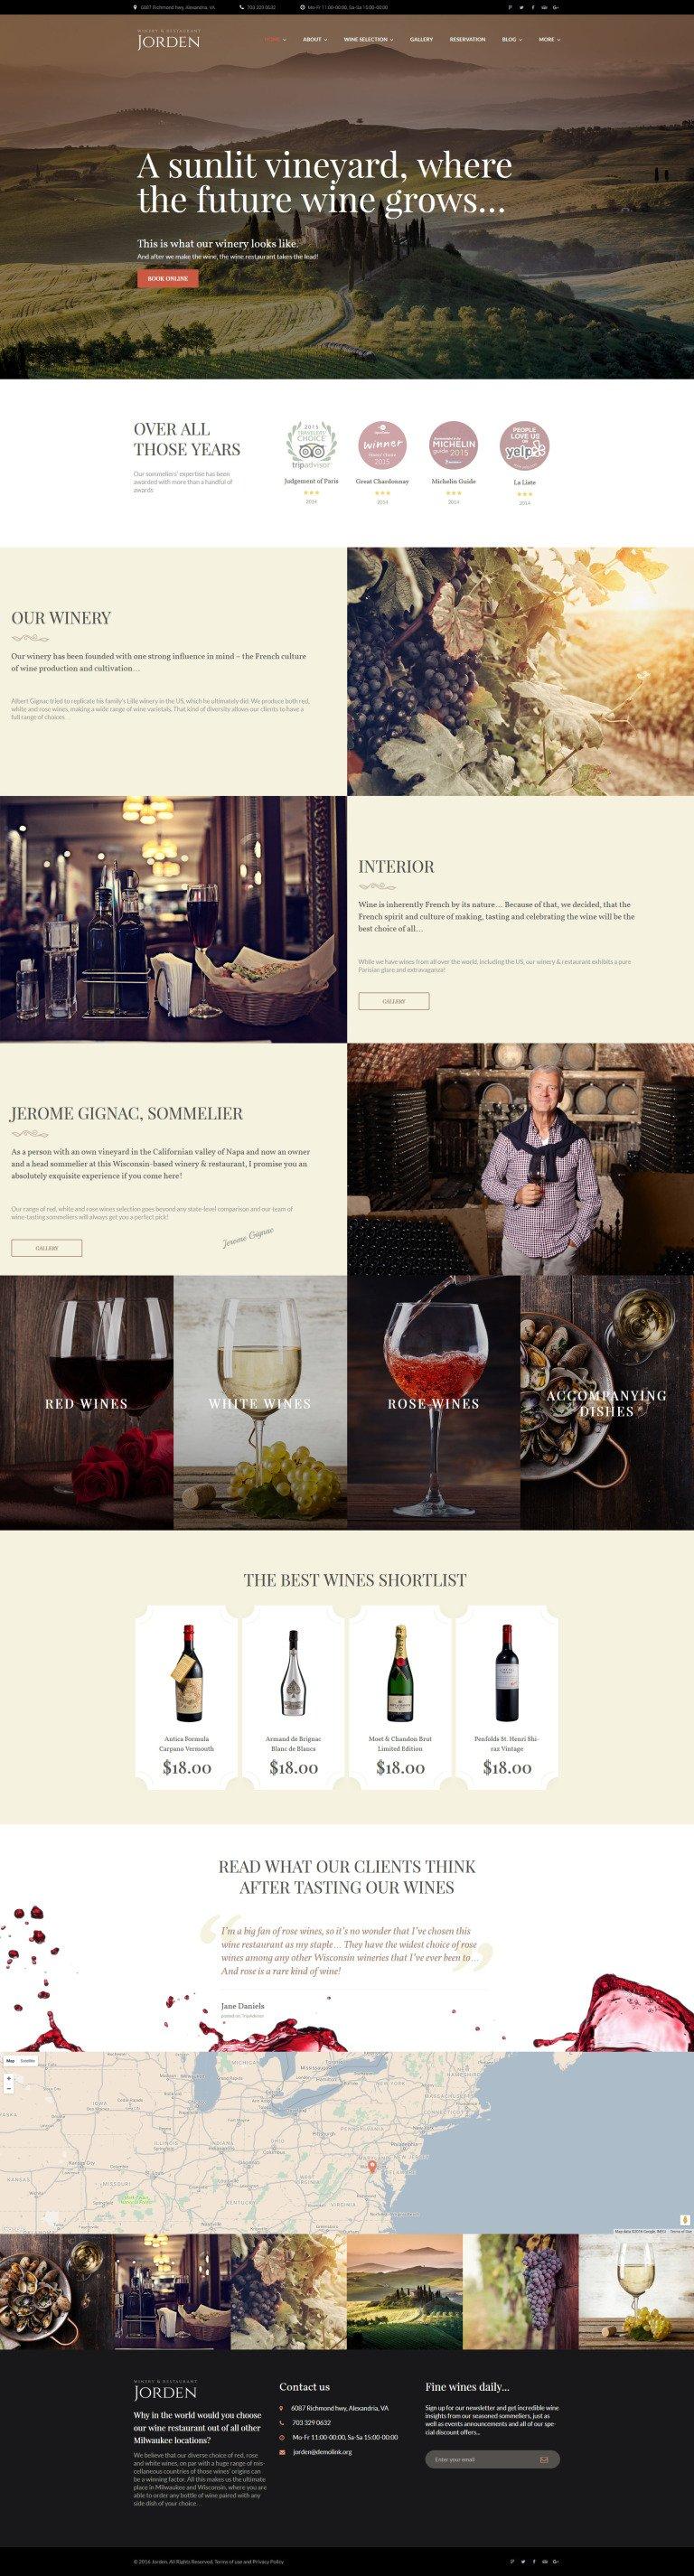 Jorden - Wine & Winery WordPress Theme New Screenshots BIG